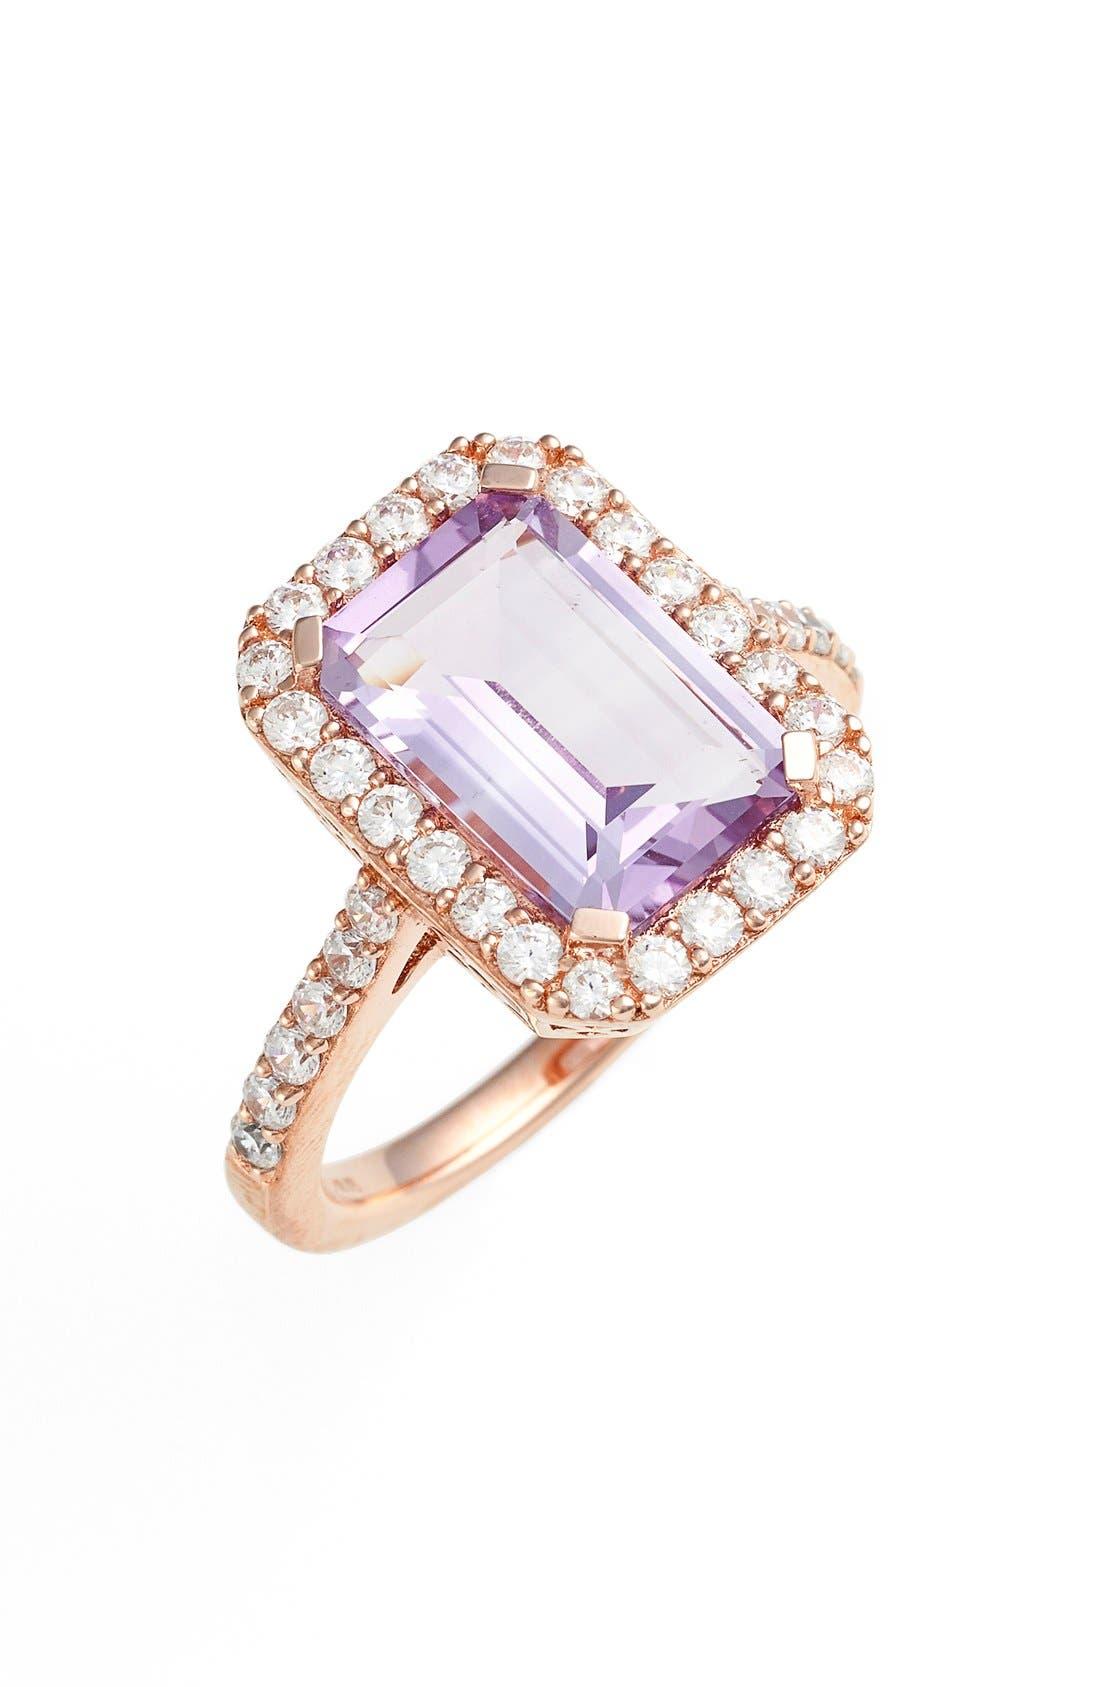 'Aria' Emerald Cut Ring,                             Main thumbnail 1, color,                             Rose Gold/ Amethyst